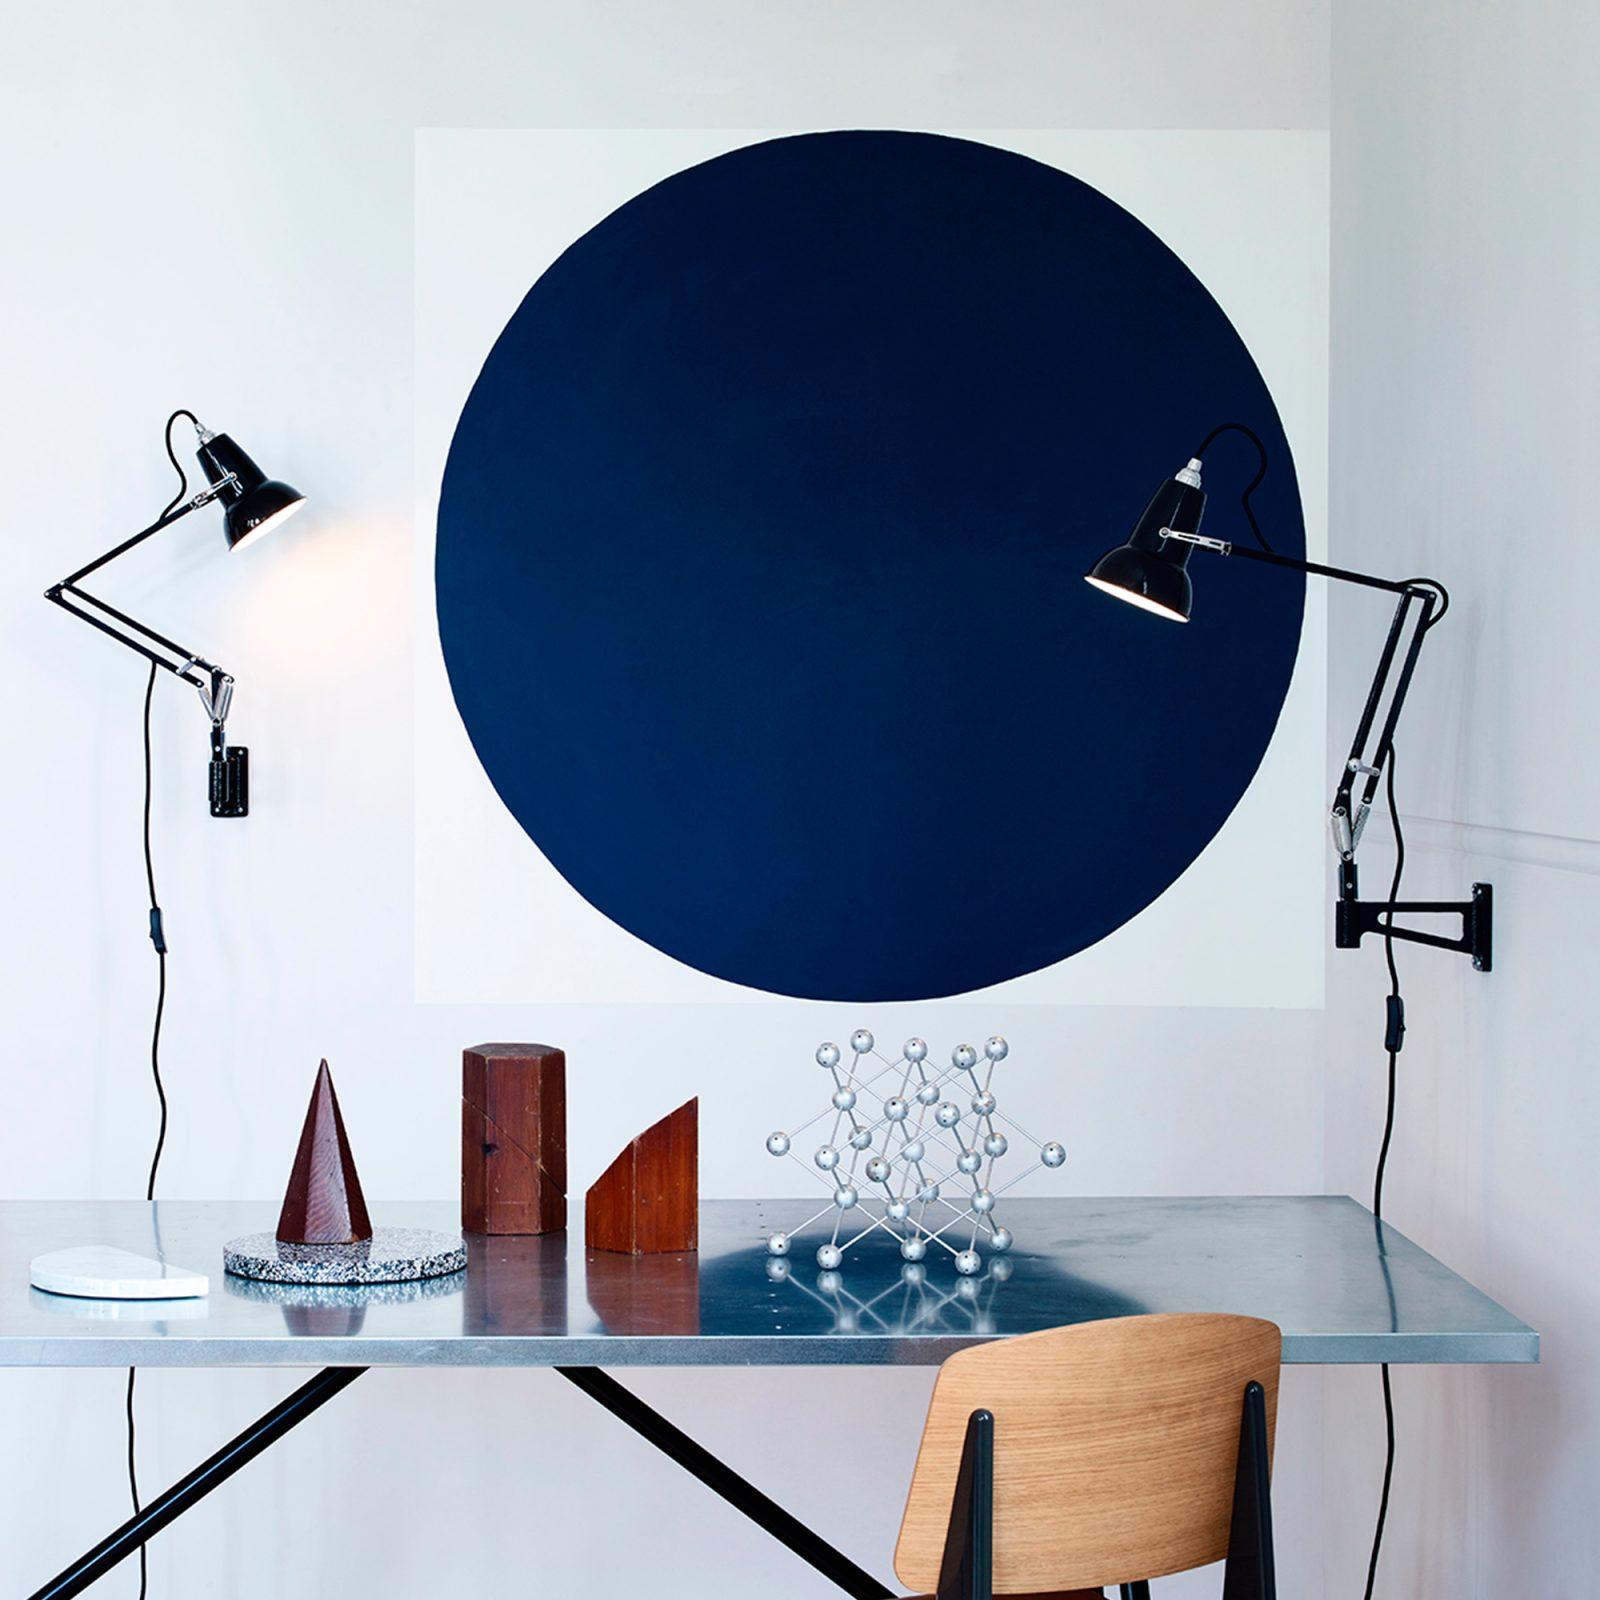 original-1227-mini-lamp-with-wall-bracket-2